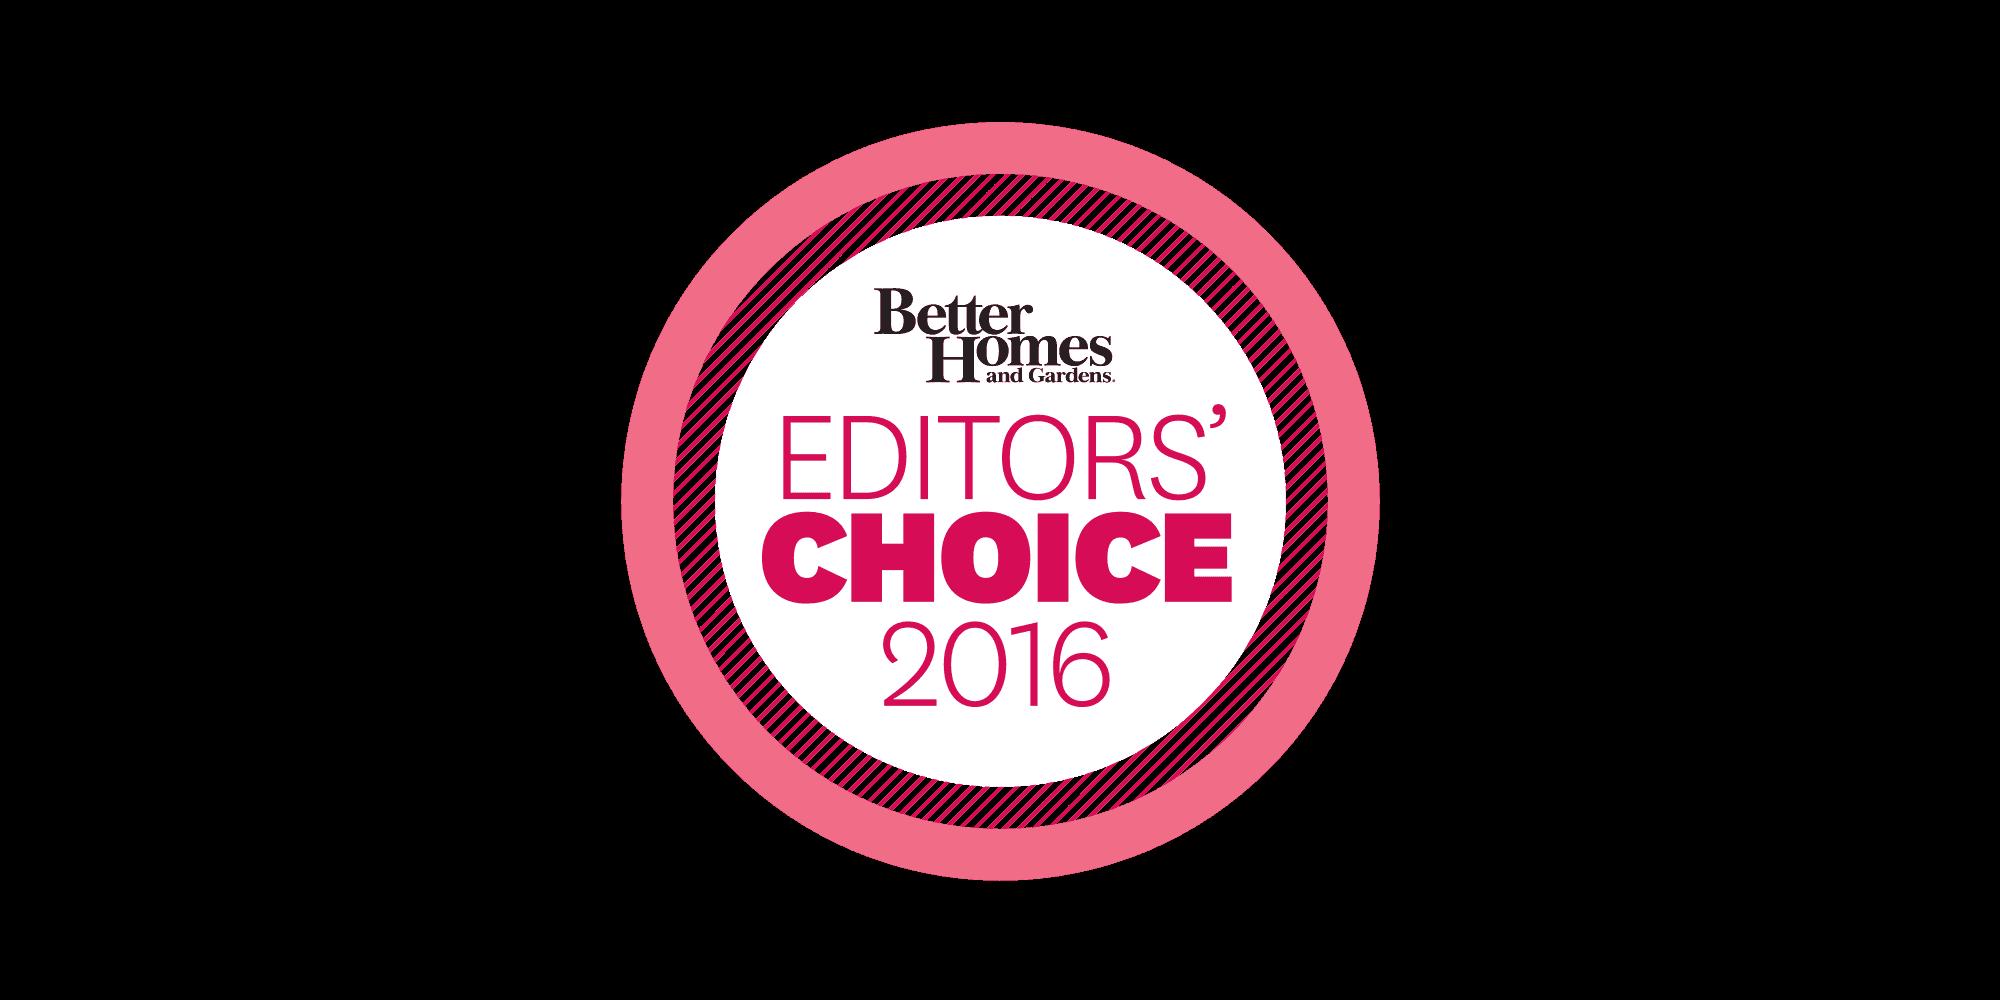 BHG Editors' Choice Innovation Awards